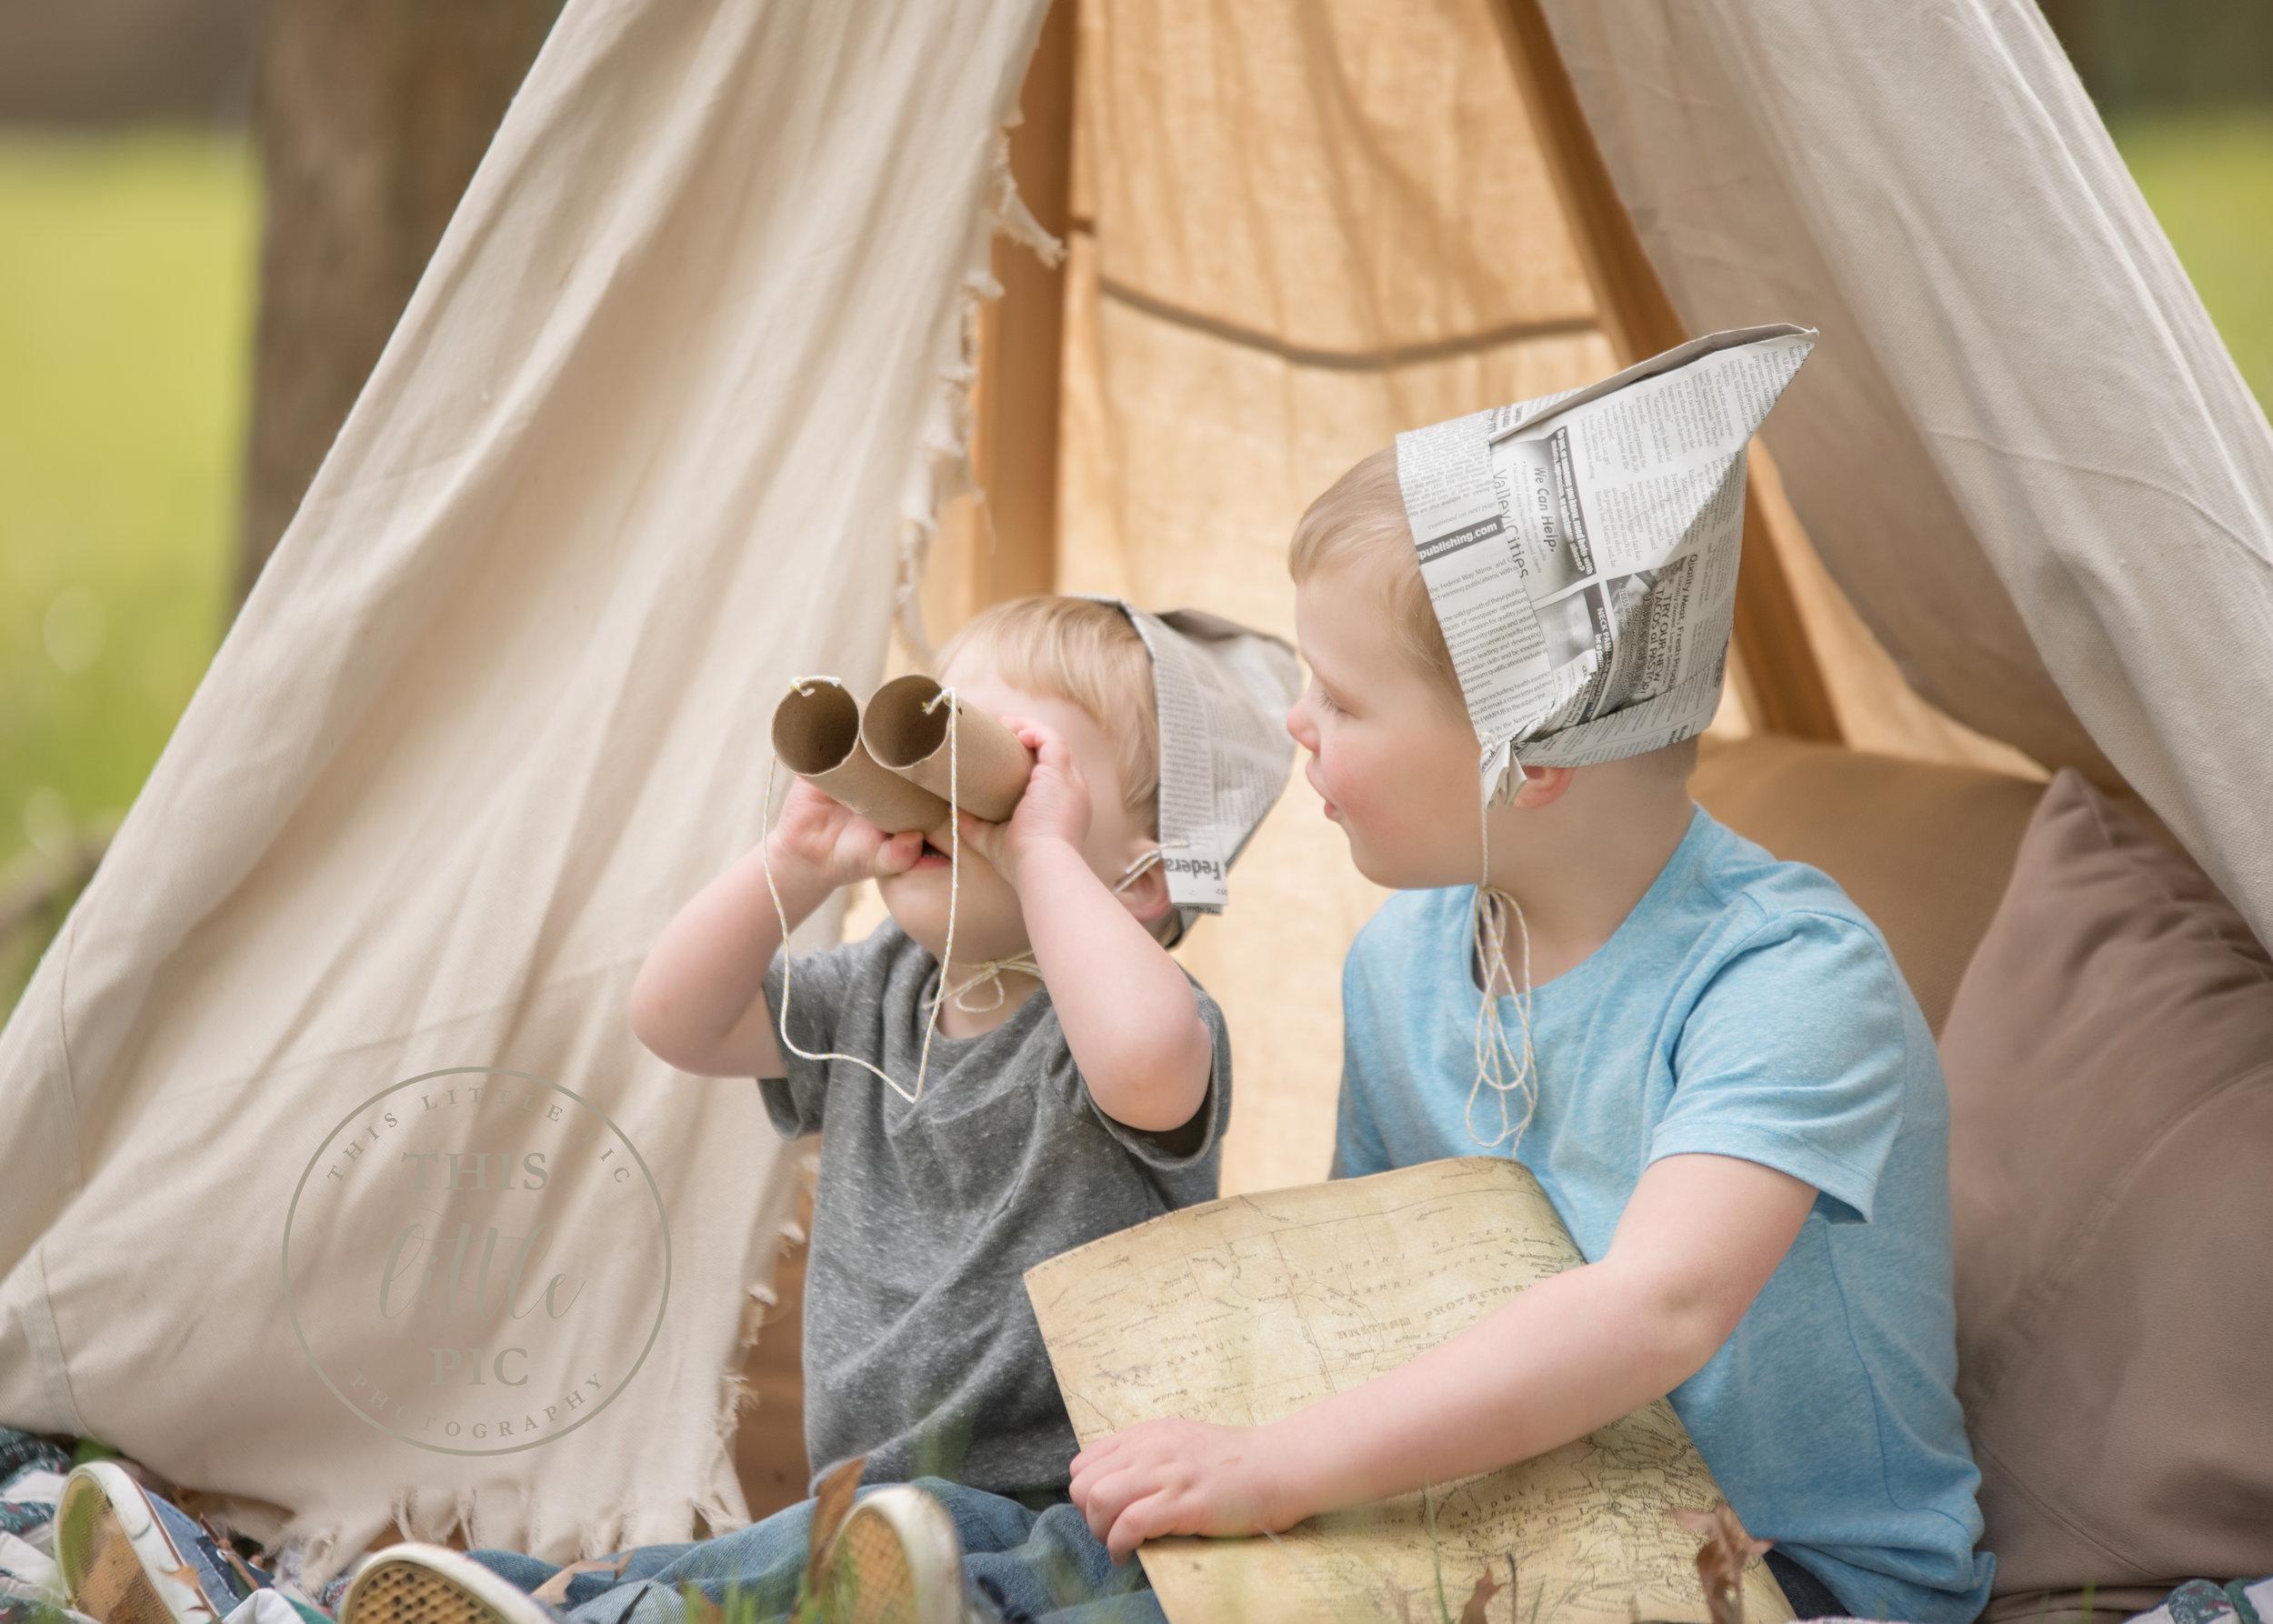 seattle children's photographer best seattle children's photographers tacoma children's photographer best tacoma children's photographer milestone photographer